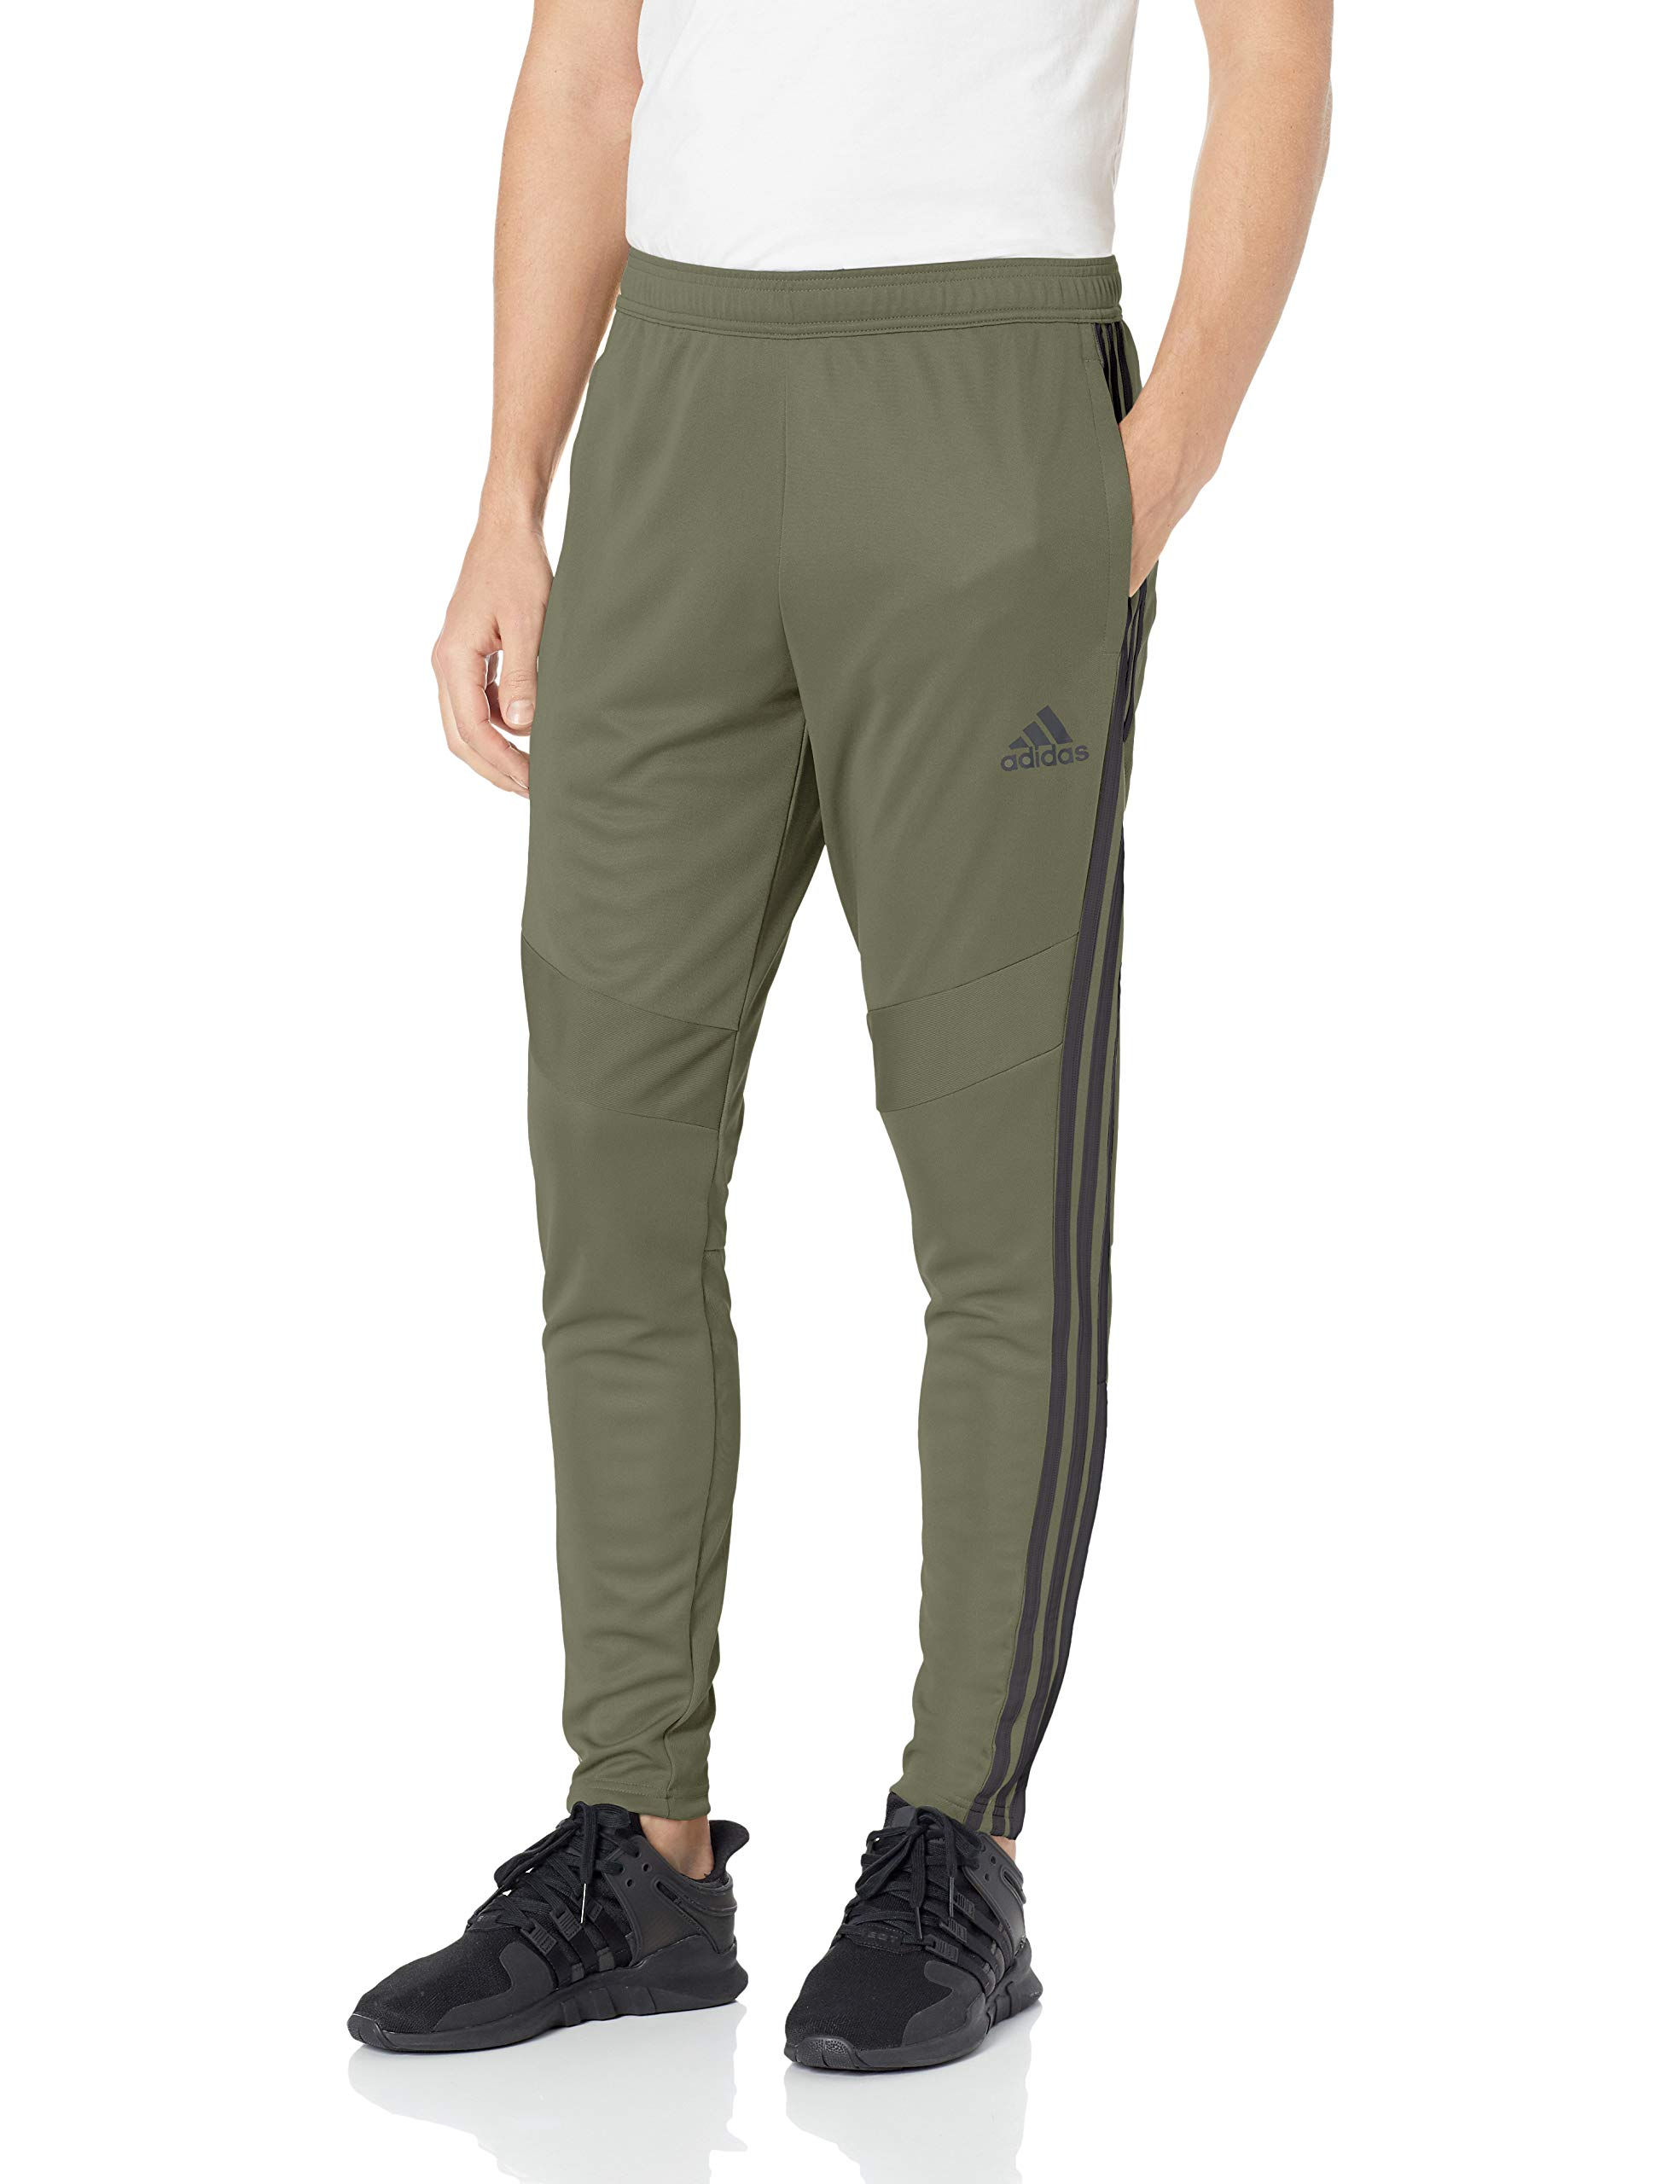 adidas Tiro19 Training Pant, Legacy Green/Grey